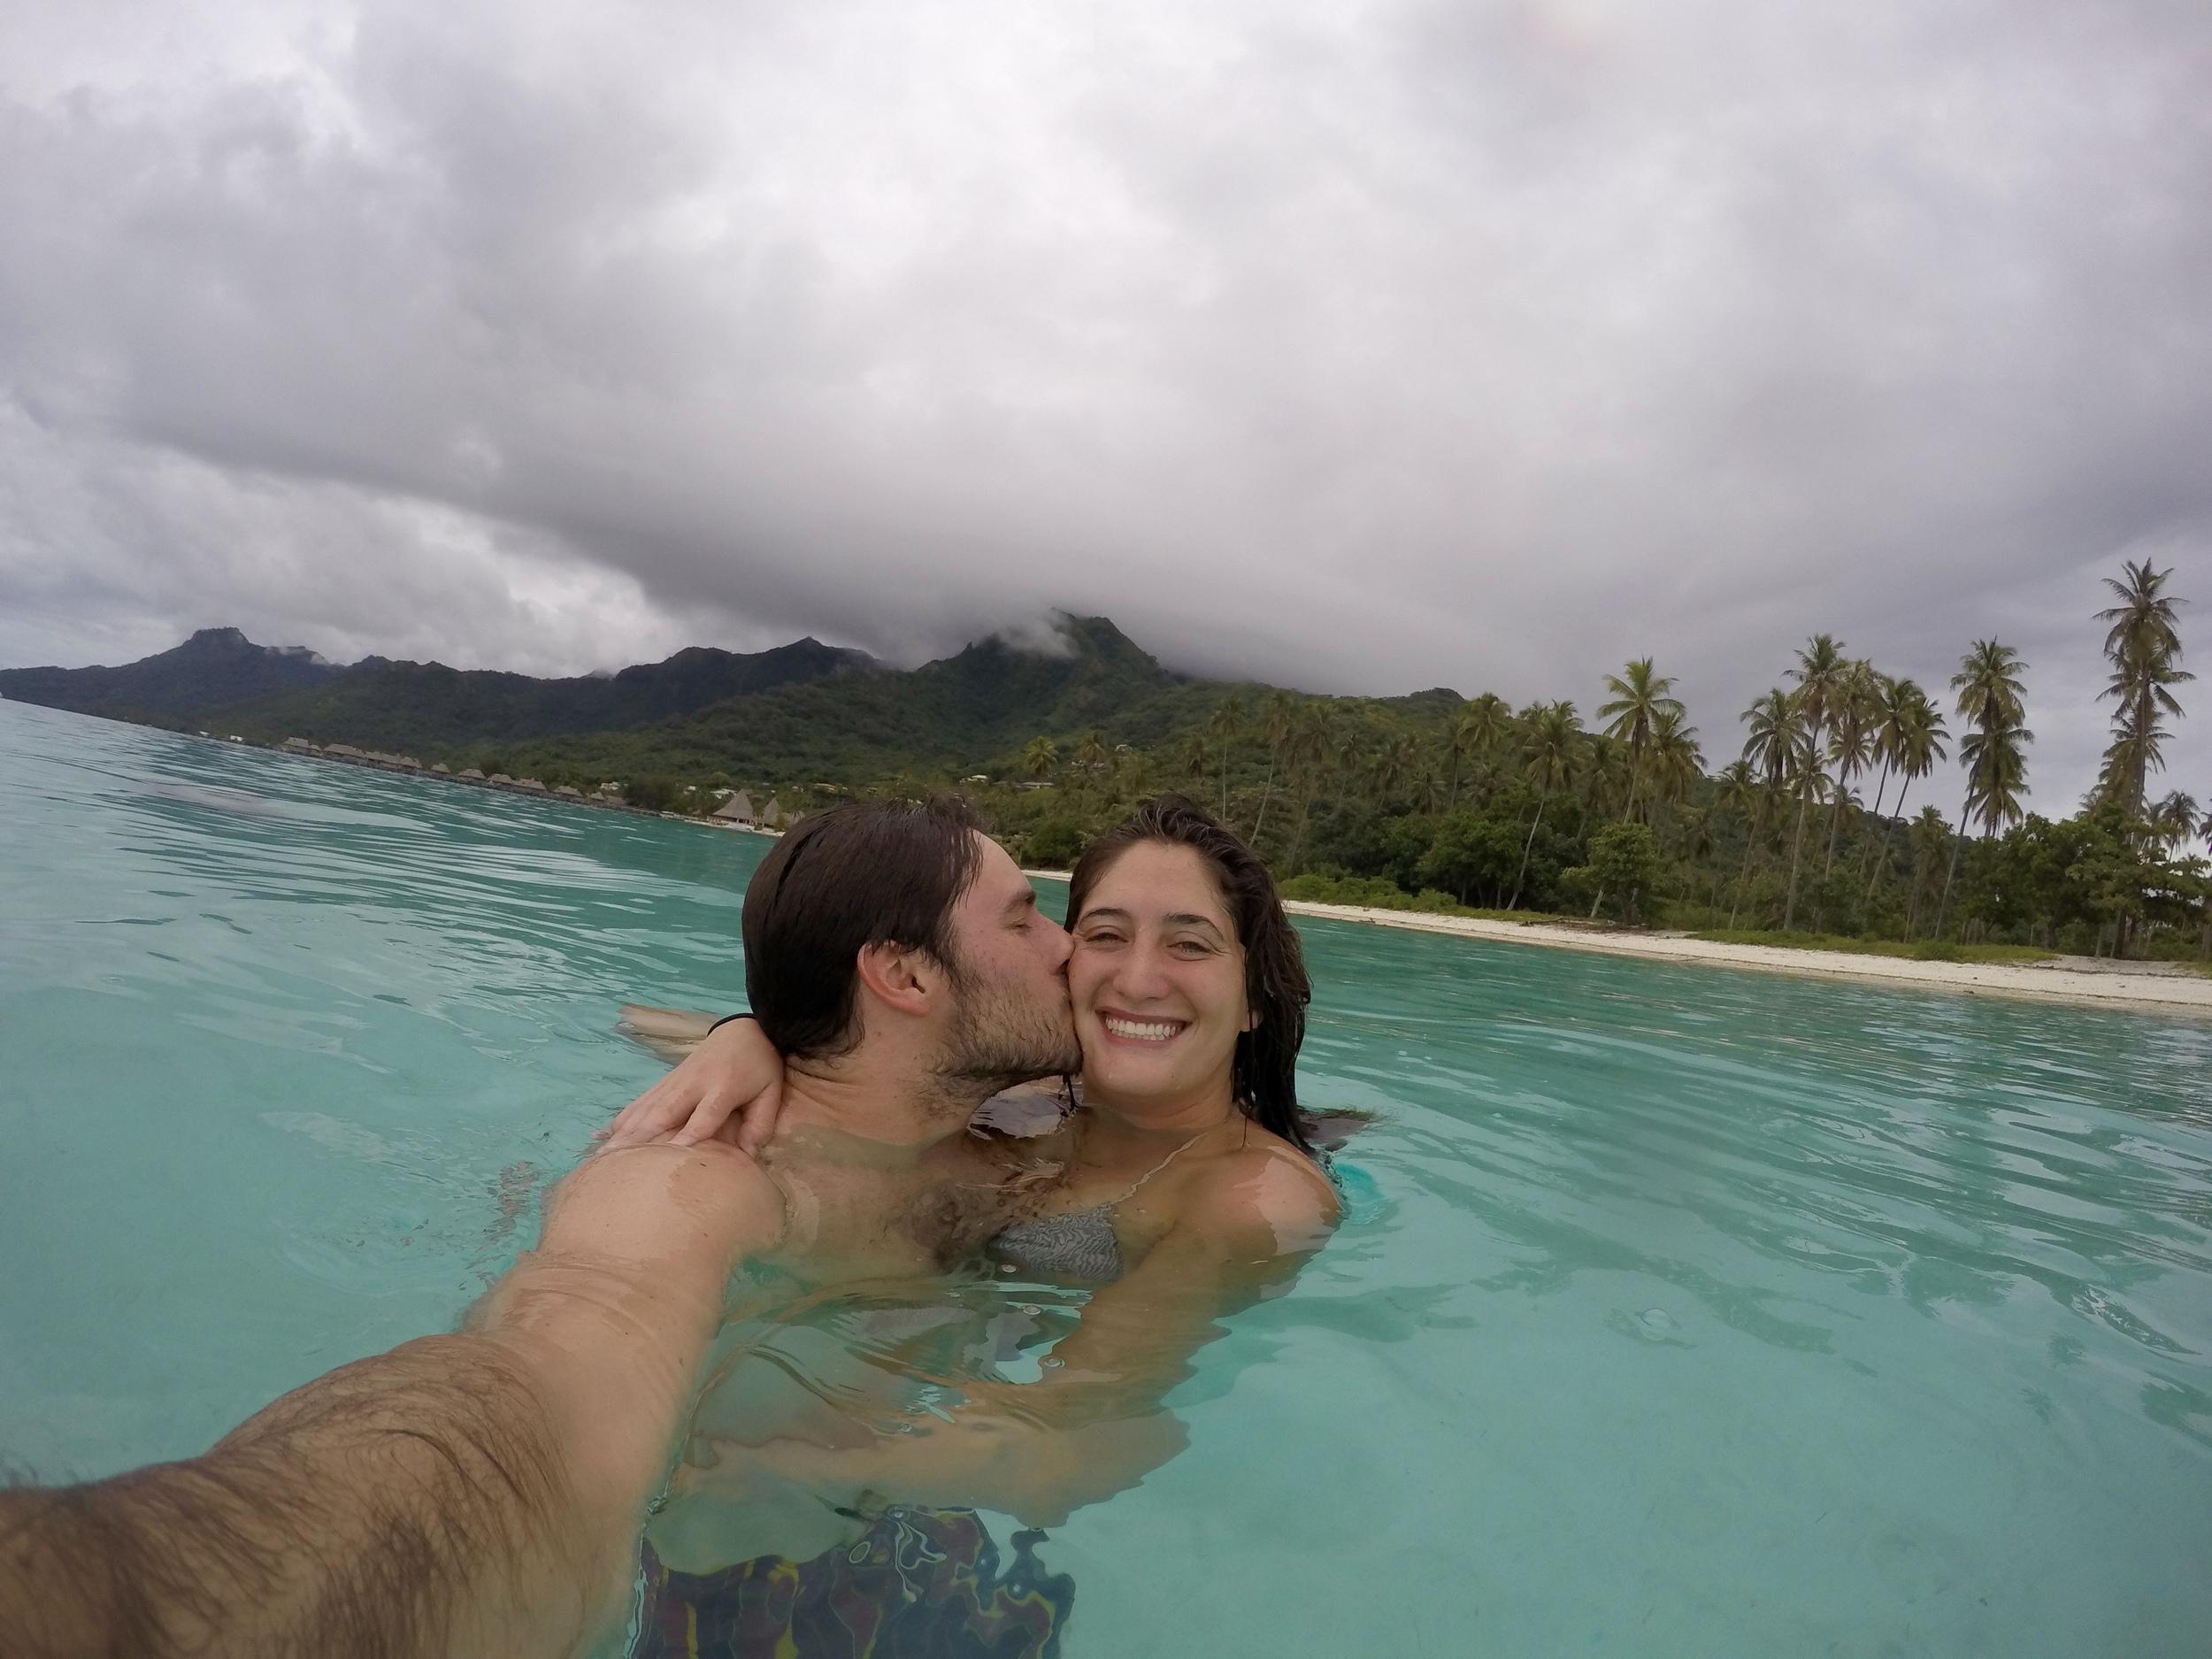 Lagoon selfie